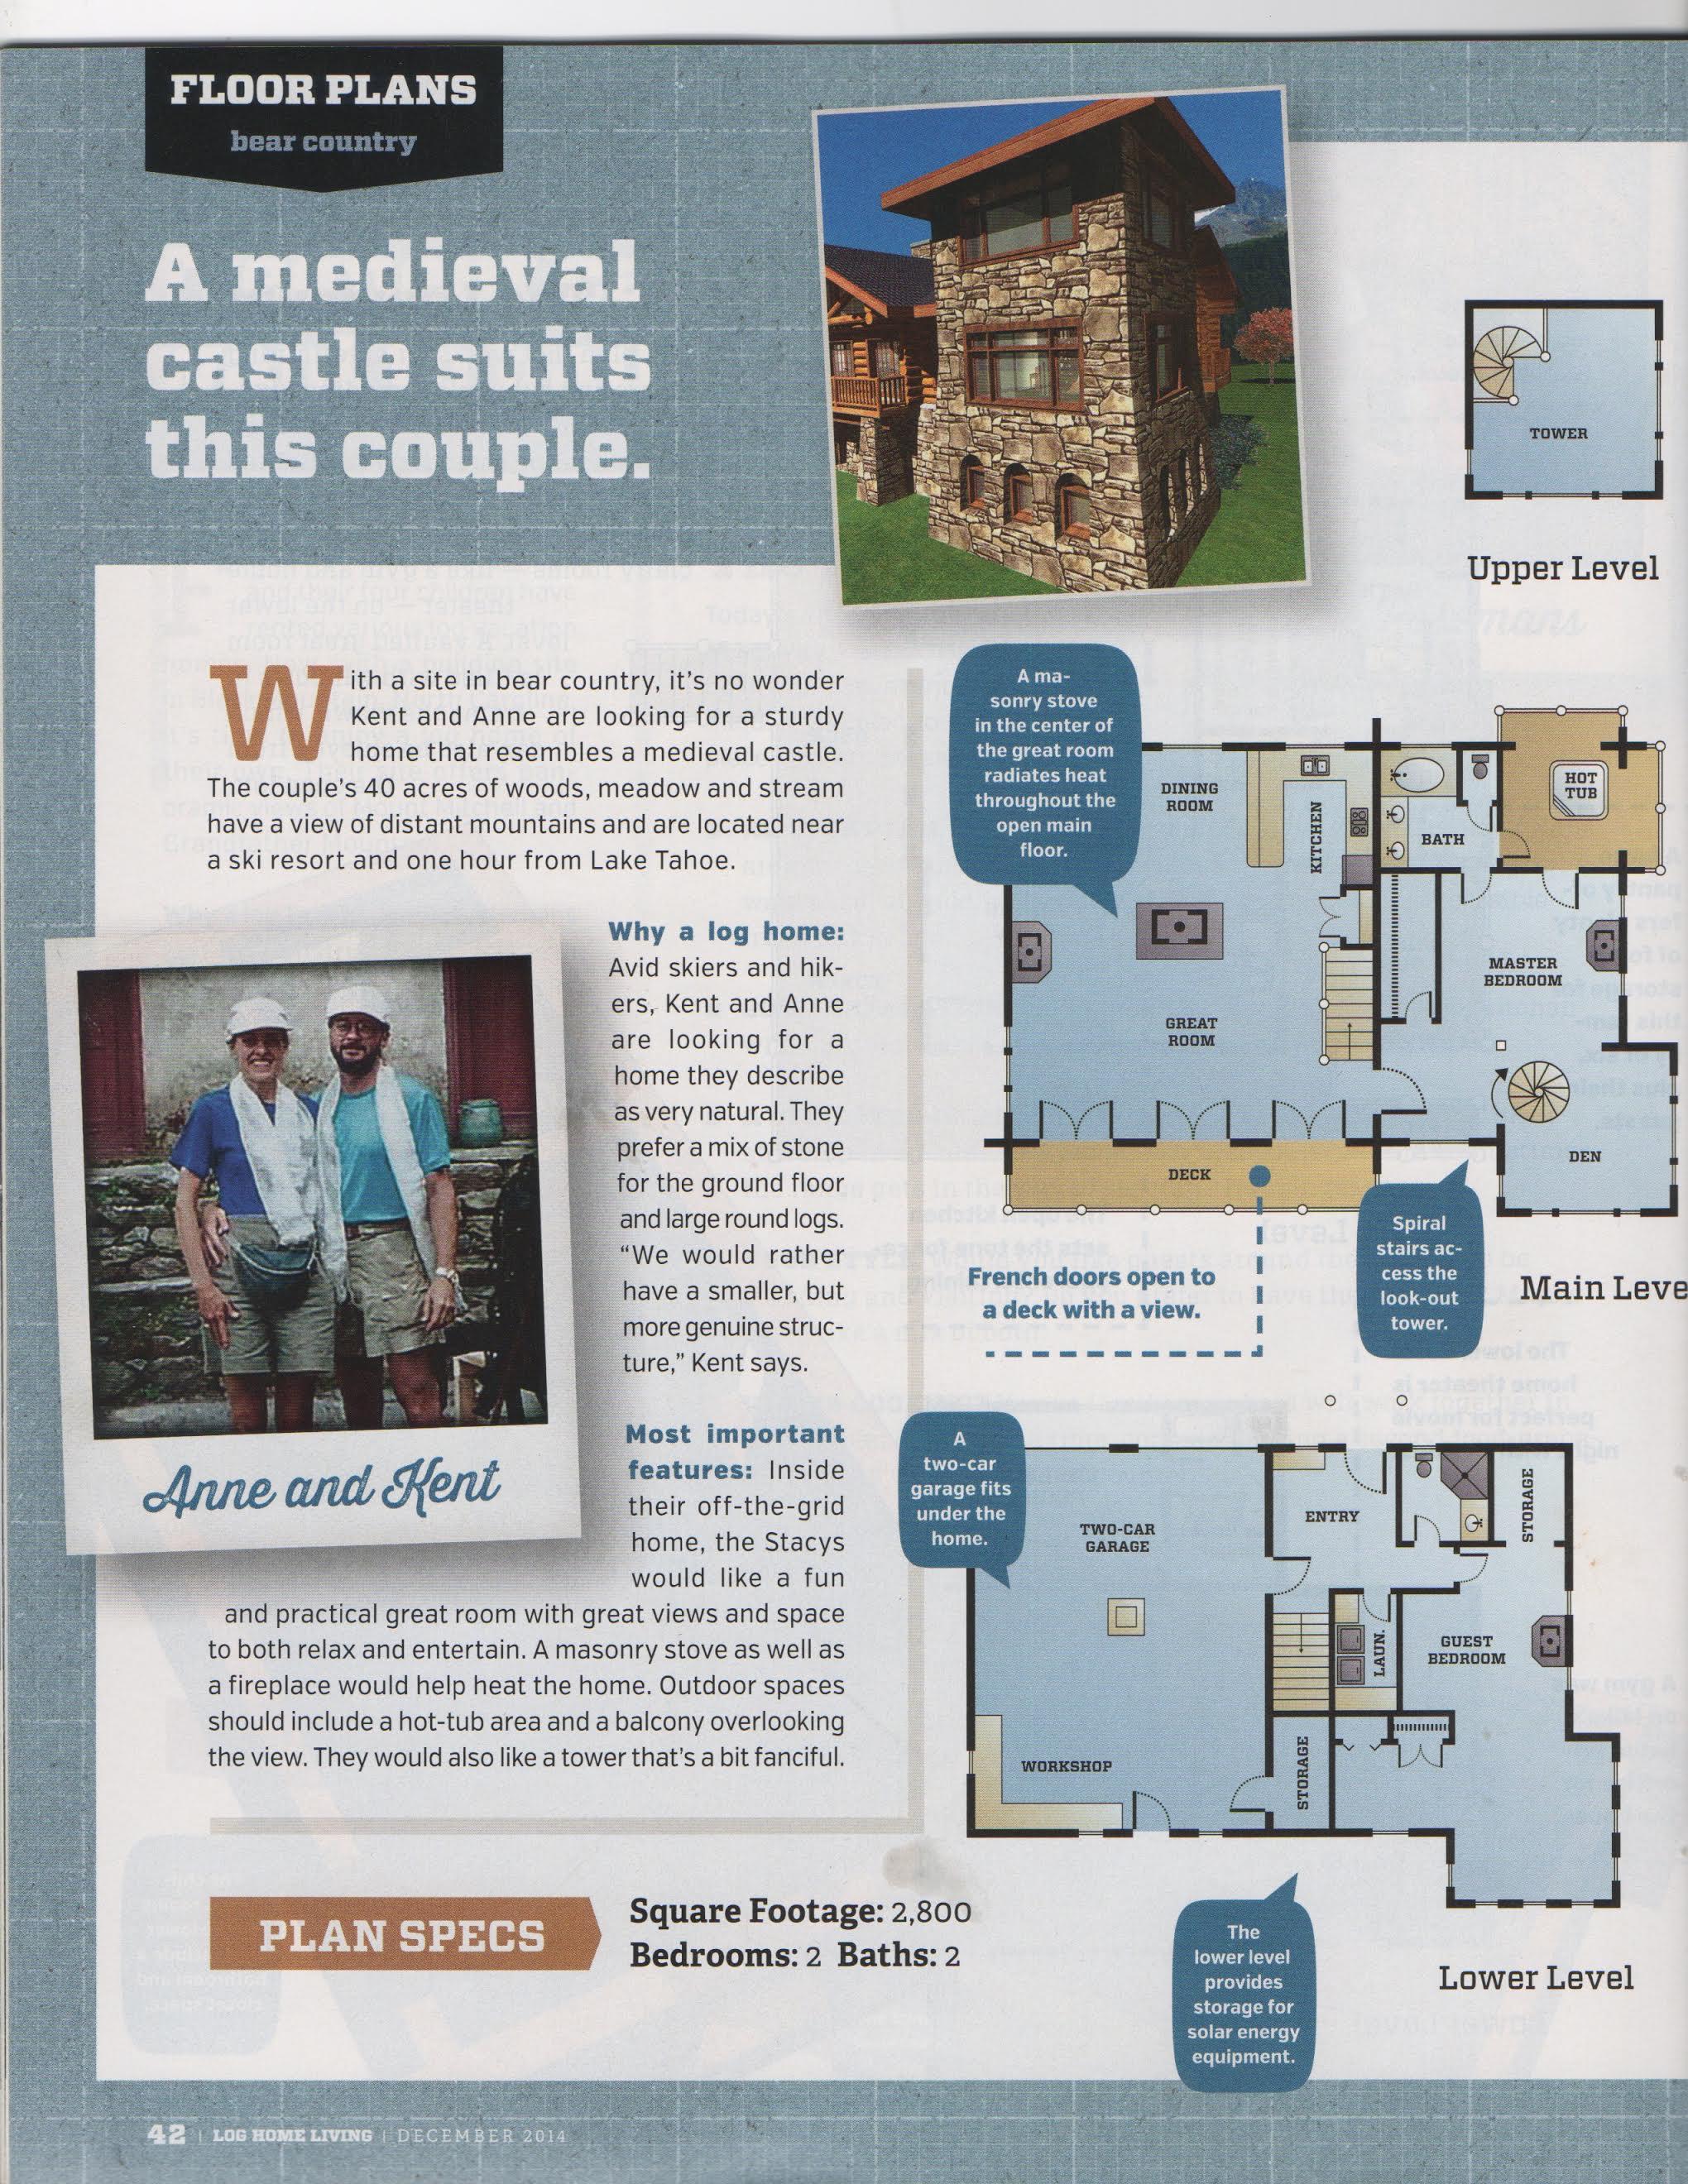 Fancy Log Home Design Magazine Images - Home Decorating Inspiration ...